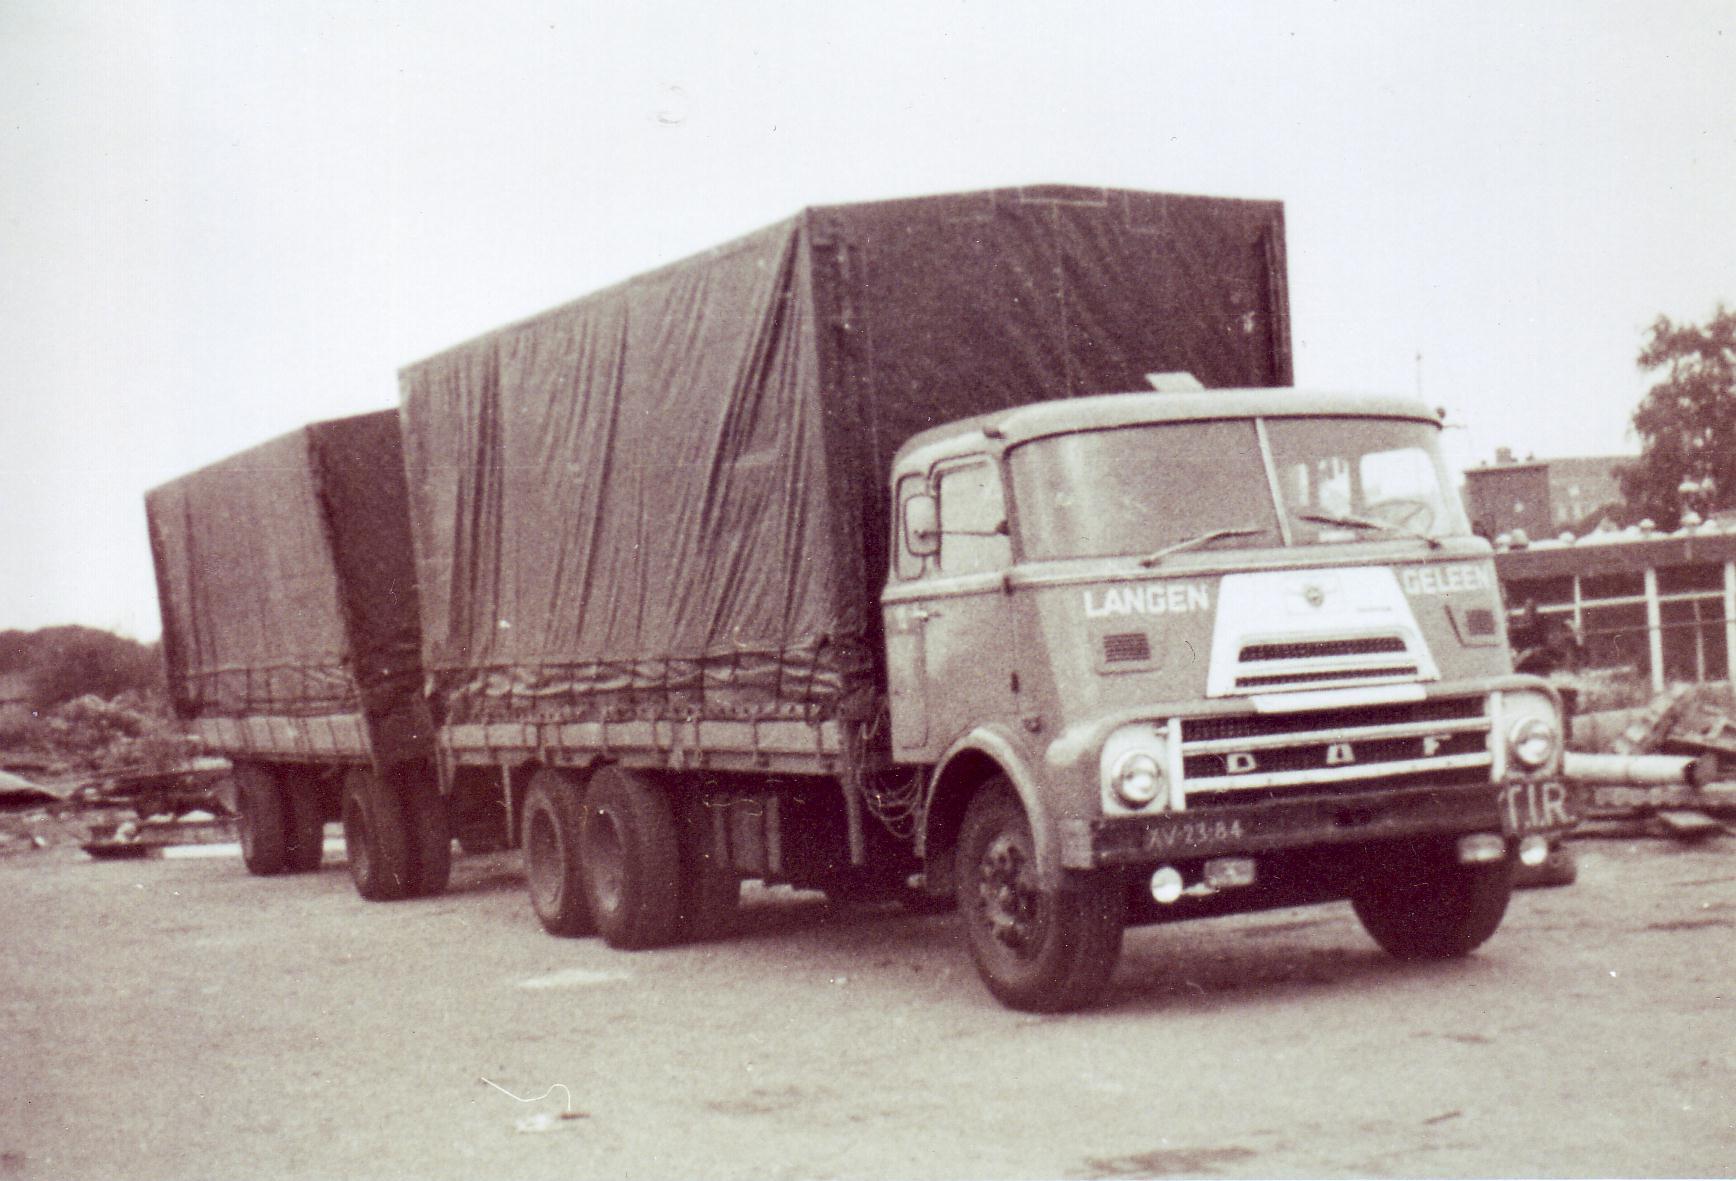 Archief-Abraham-Villamayor-Duran-Badalona-86